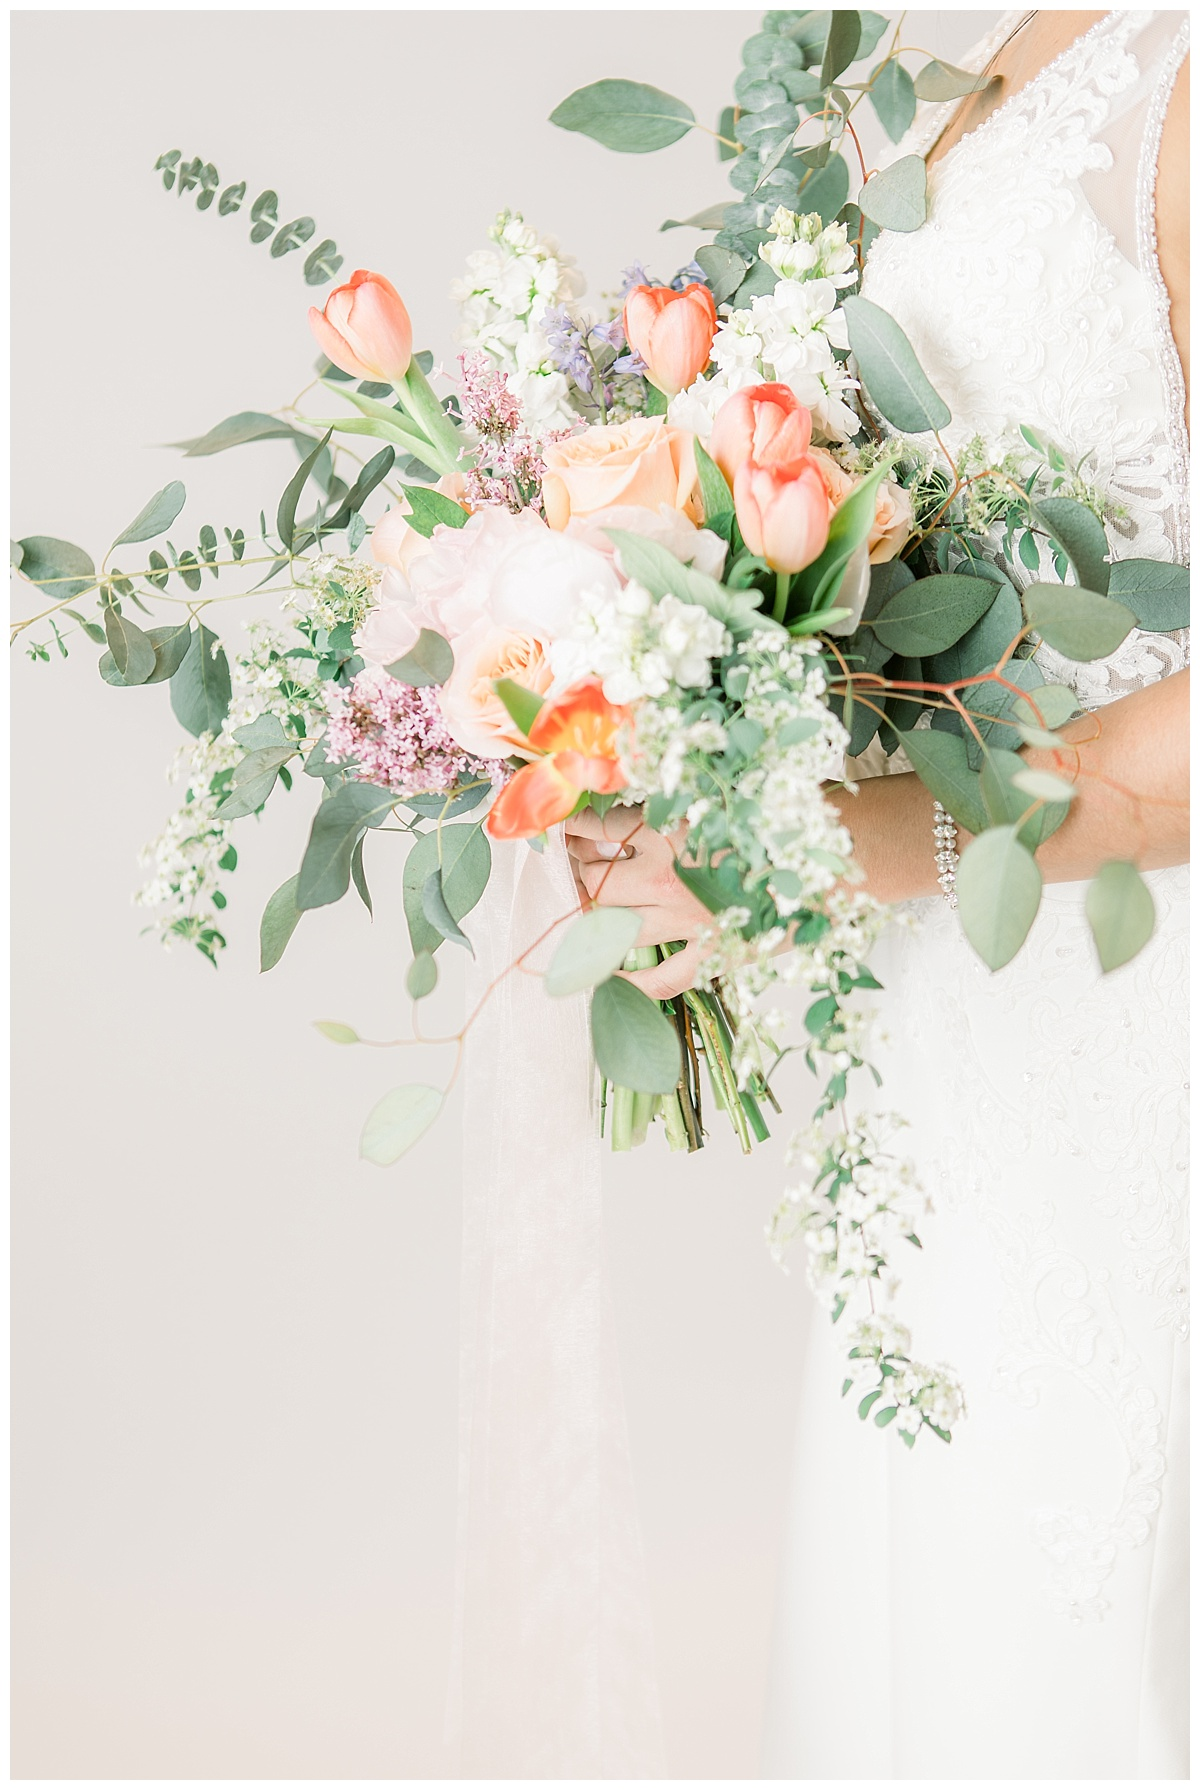 Central-Illinois-Wedding-Photographer-Cissna-Park-Engagement-SEssion-Orpheum-Museum_0576.jpg